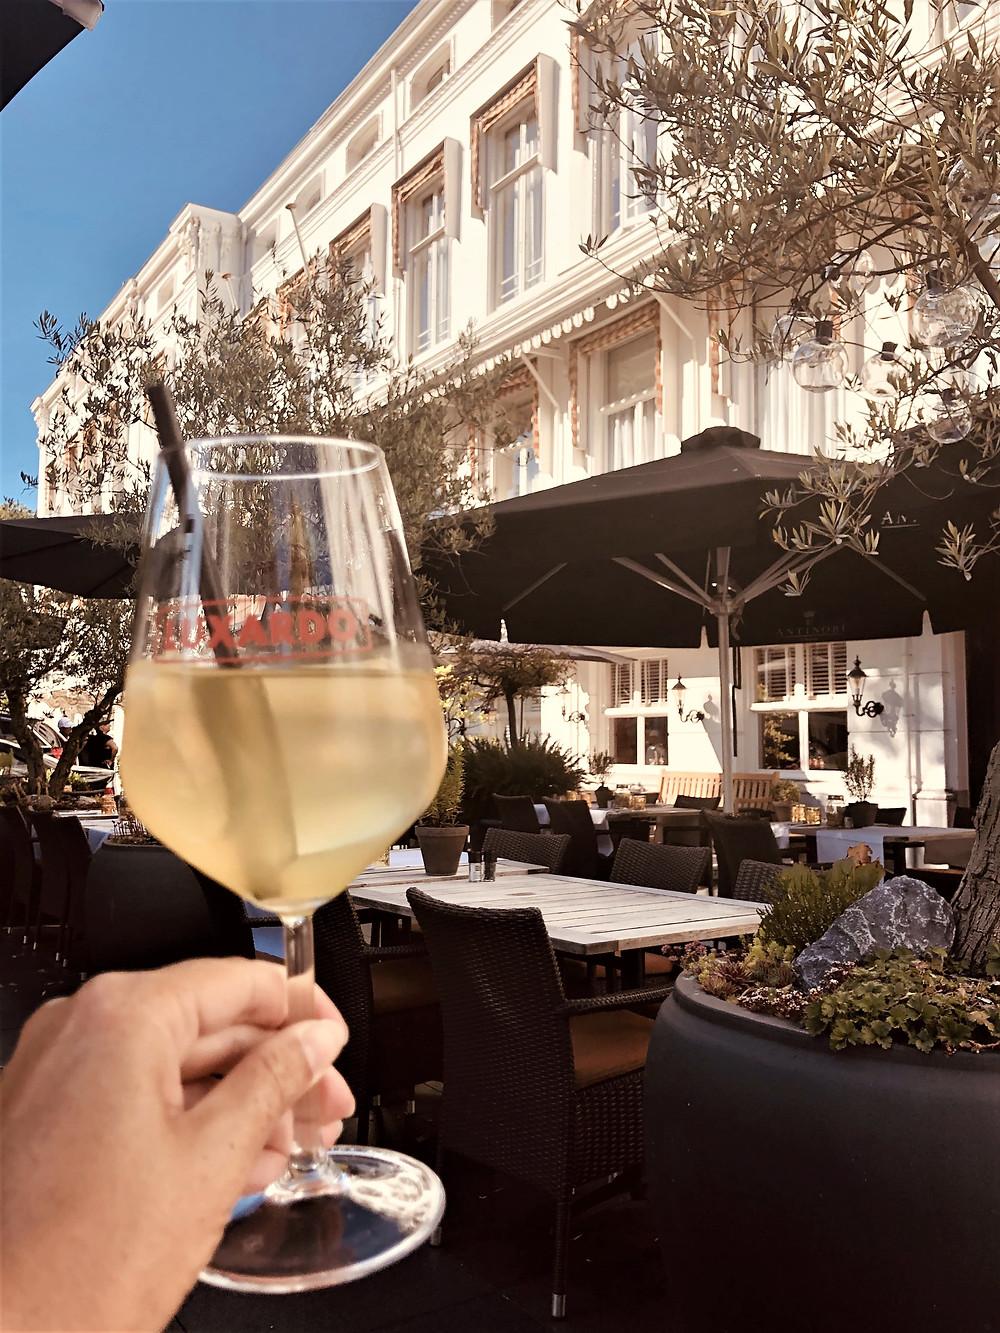 Cheers Carlton Ambassador Hotel The Hague Restaurant Sophia - The Netherlands